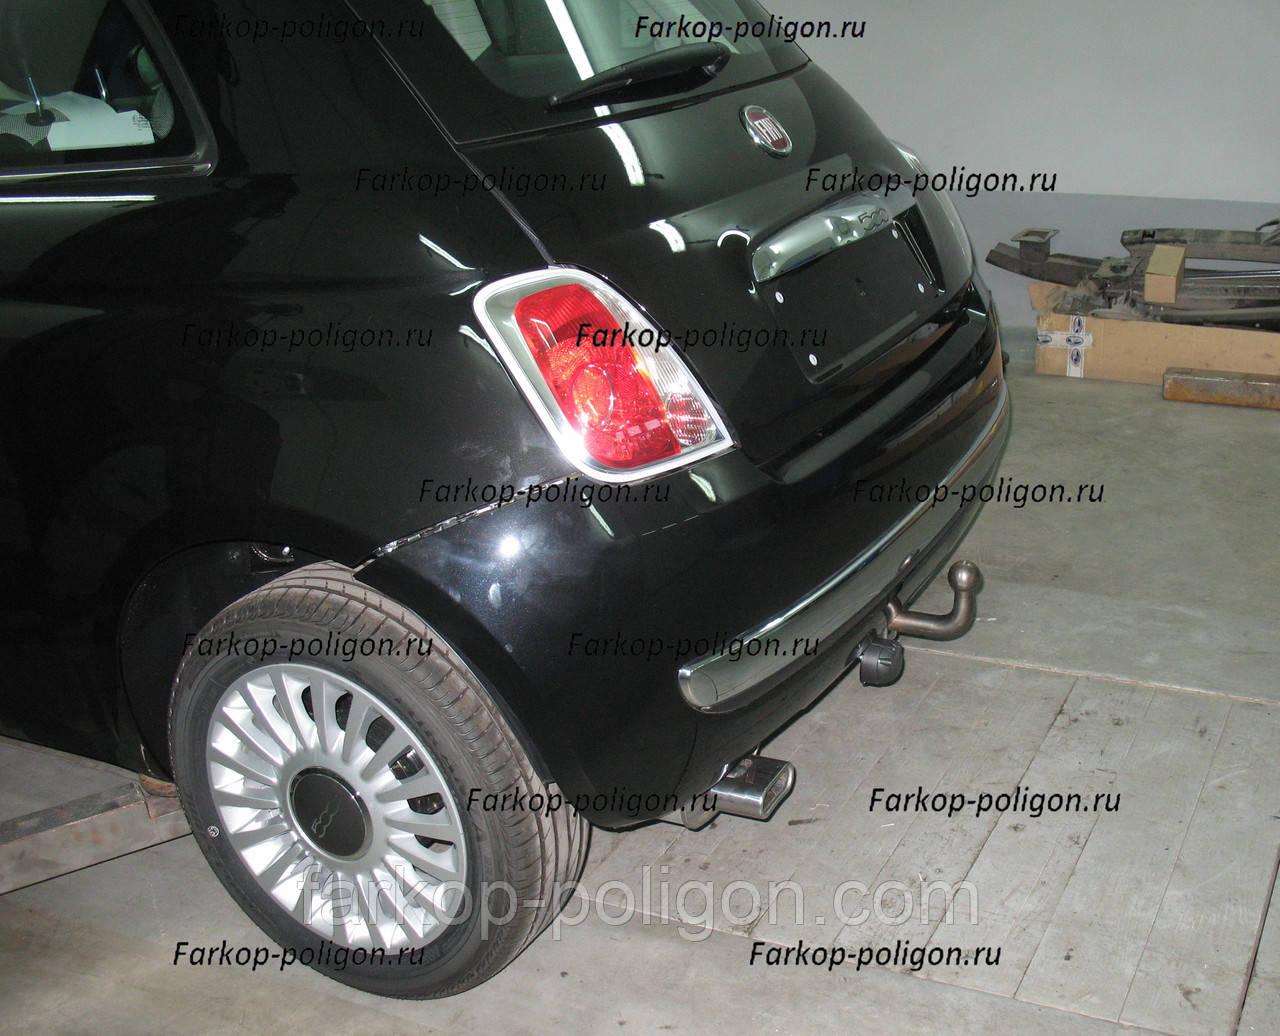 Фаркоп FIAT 500 с 2007 г